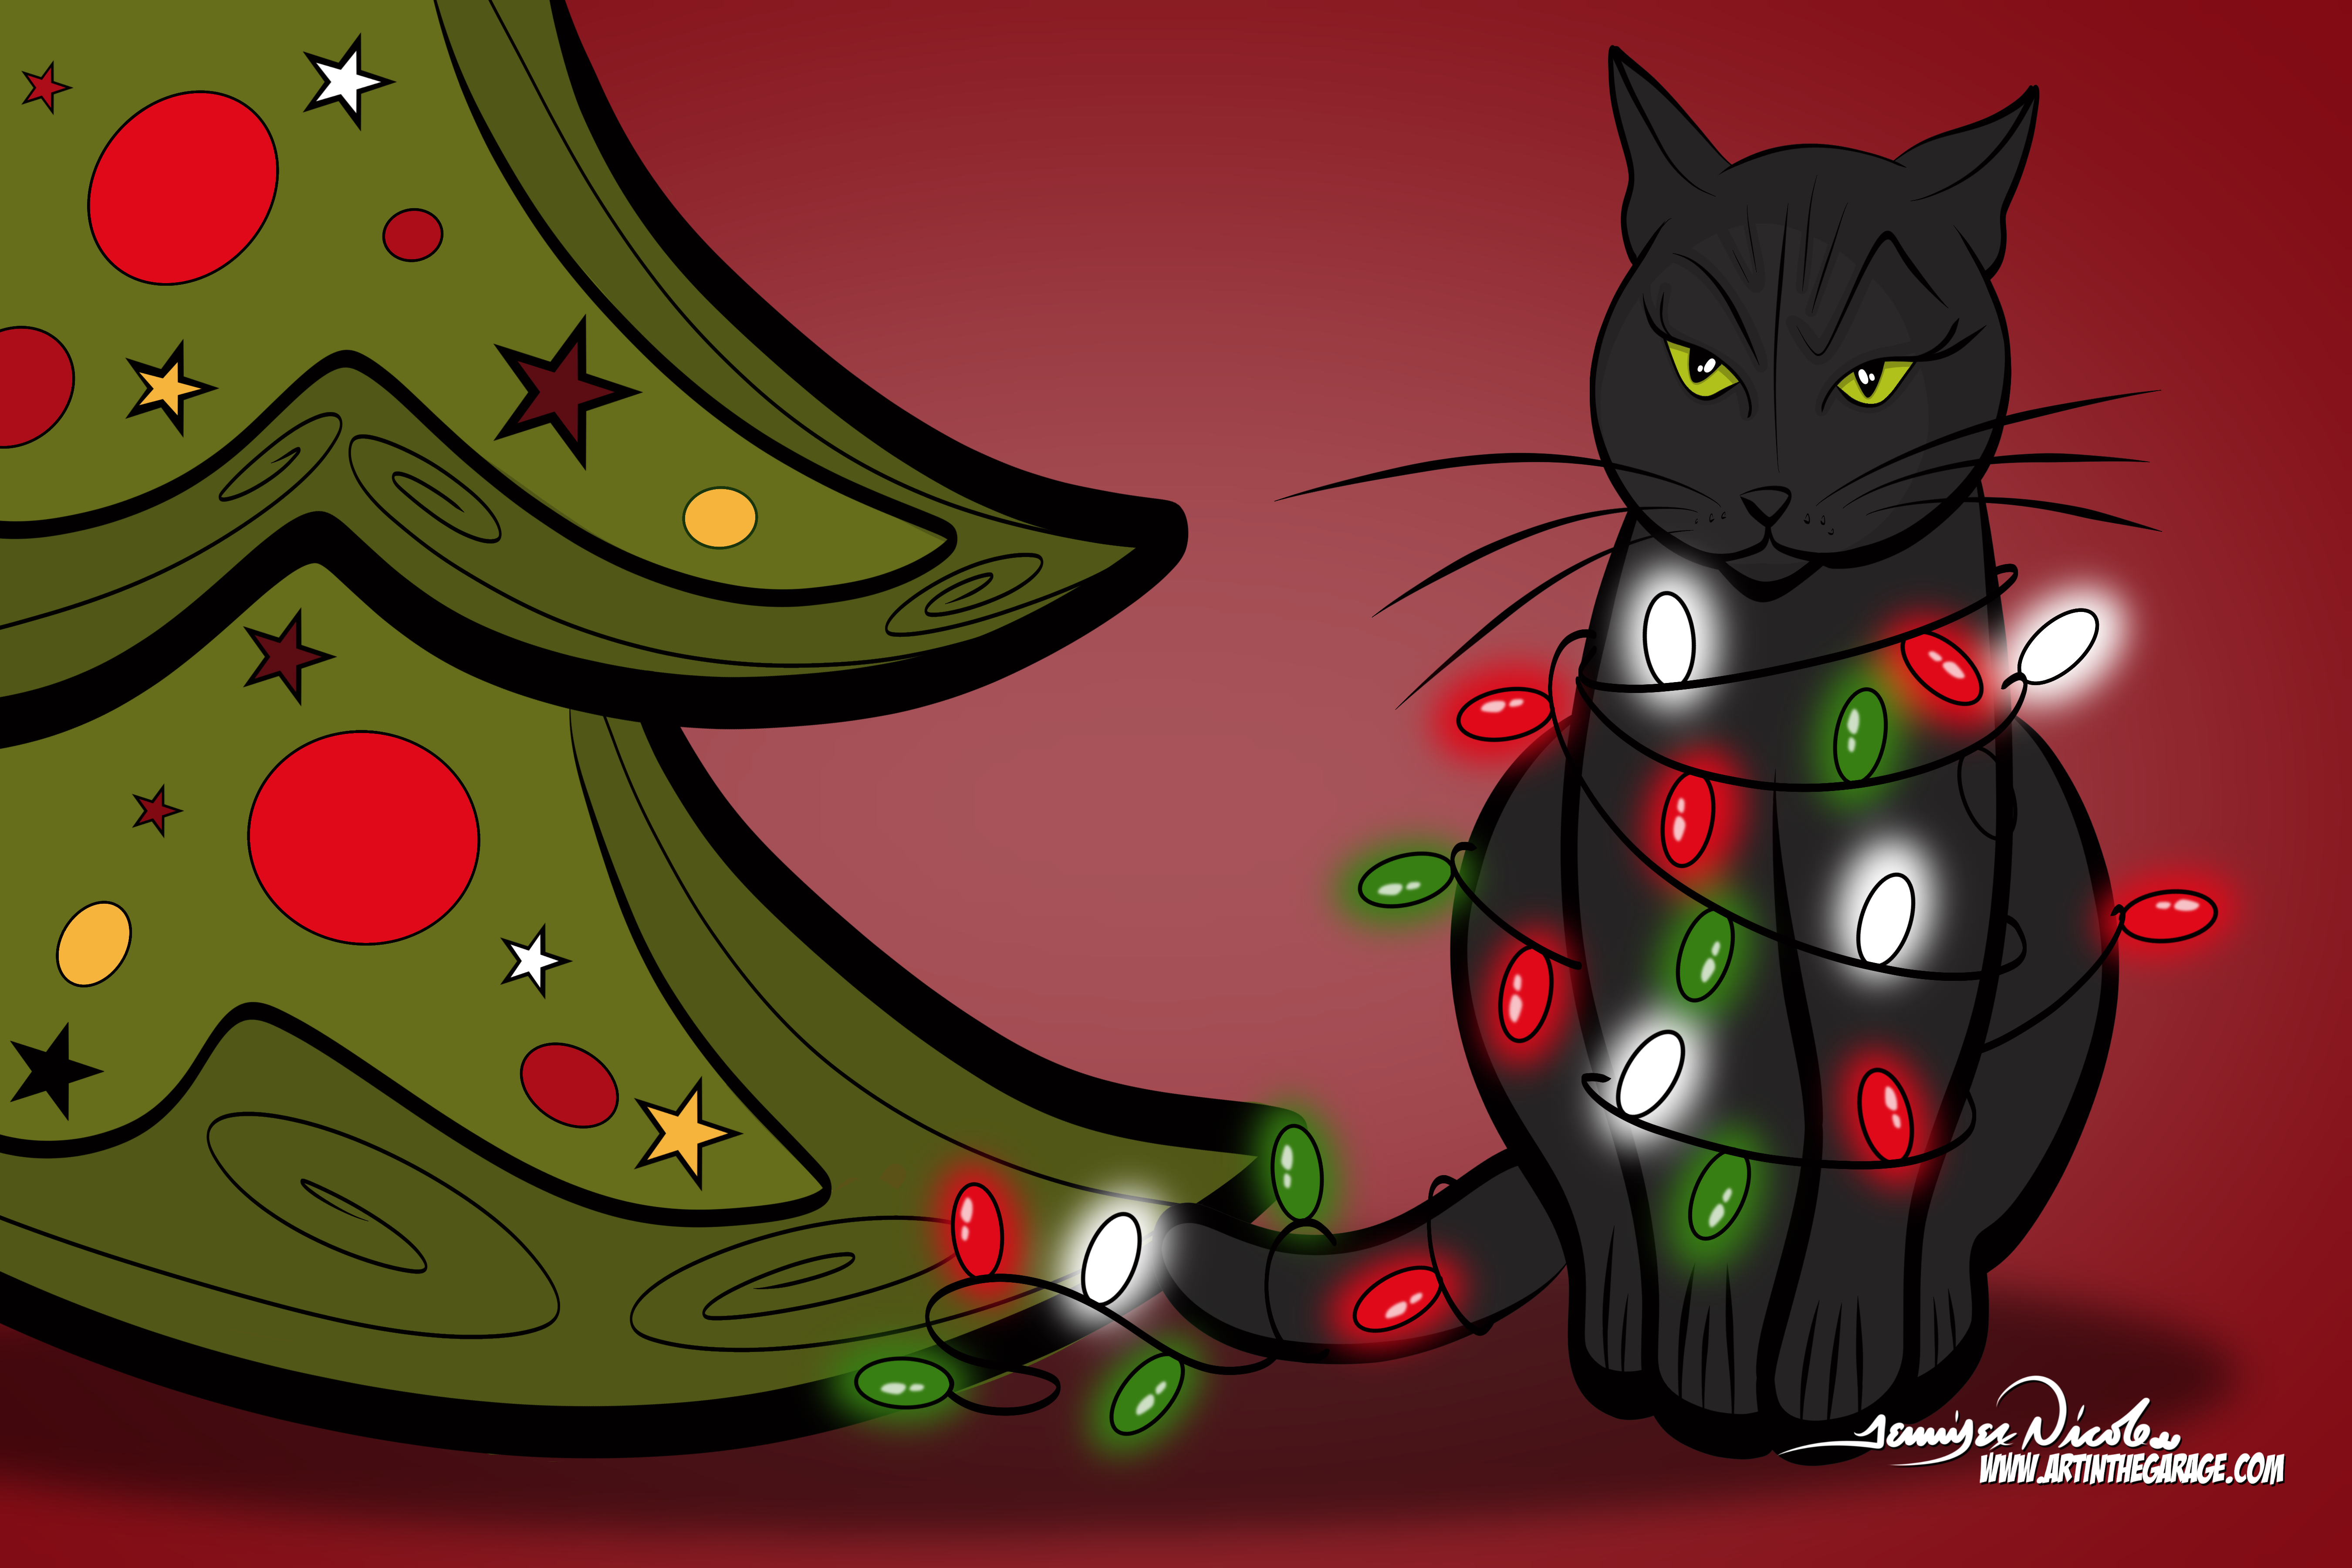 12-7-19 Holiday Decorations